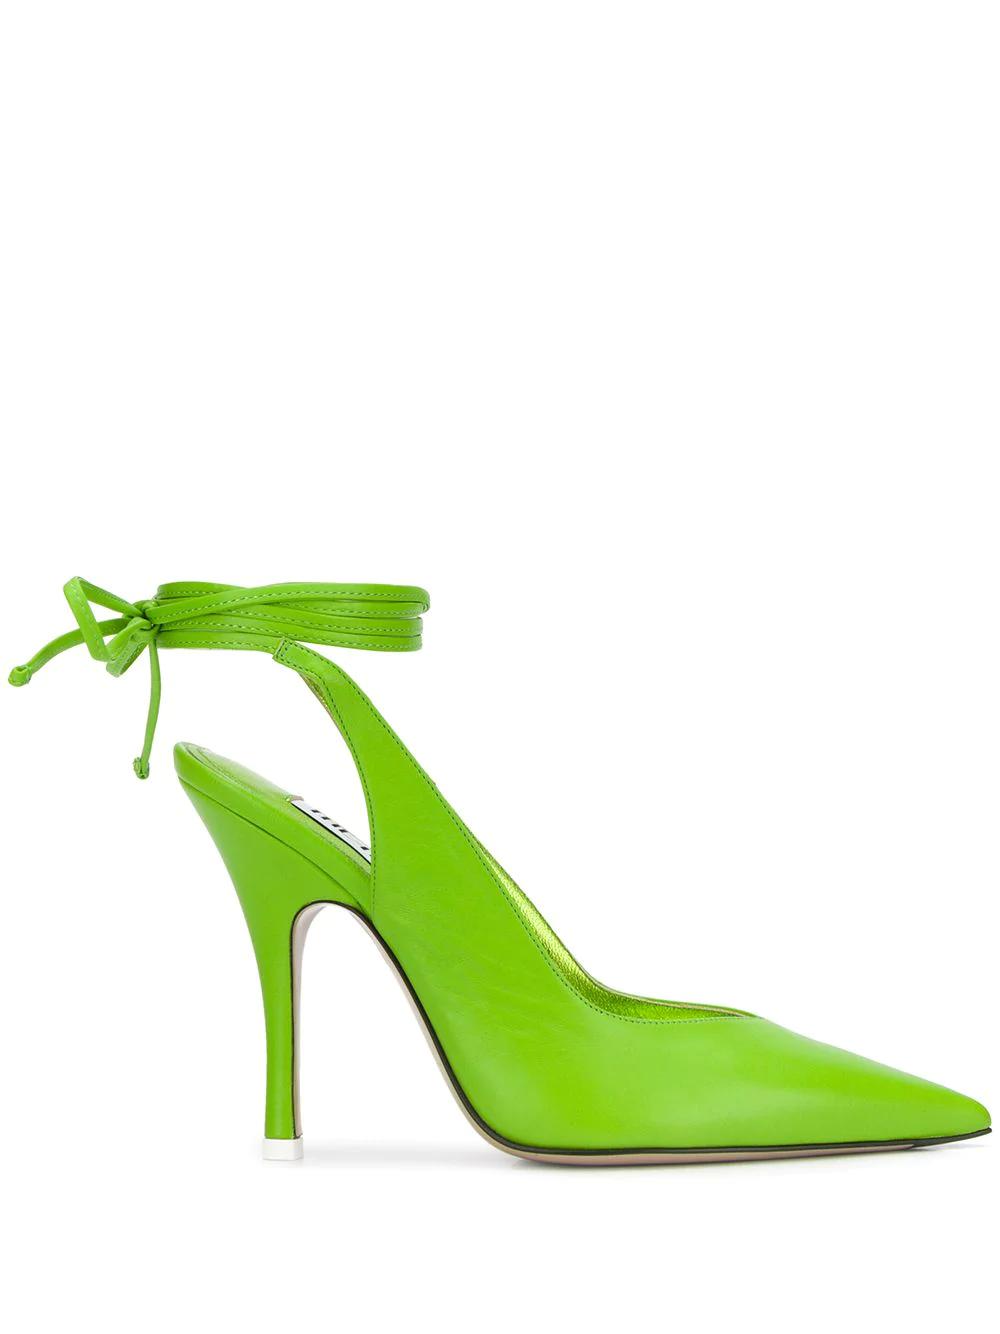 The Attico Pointed High Heel Pumps Farfetch Pumps Heels Green High Heels Heels